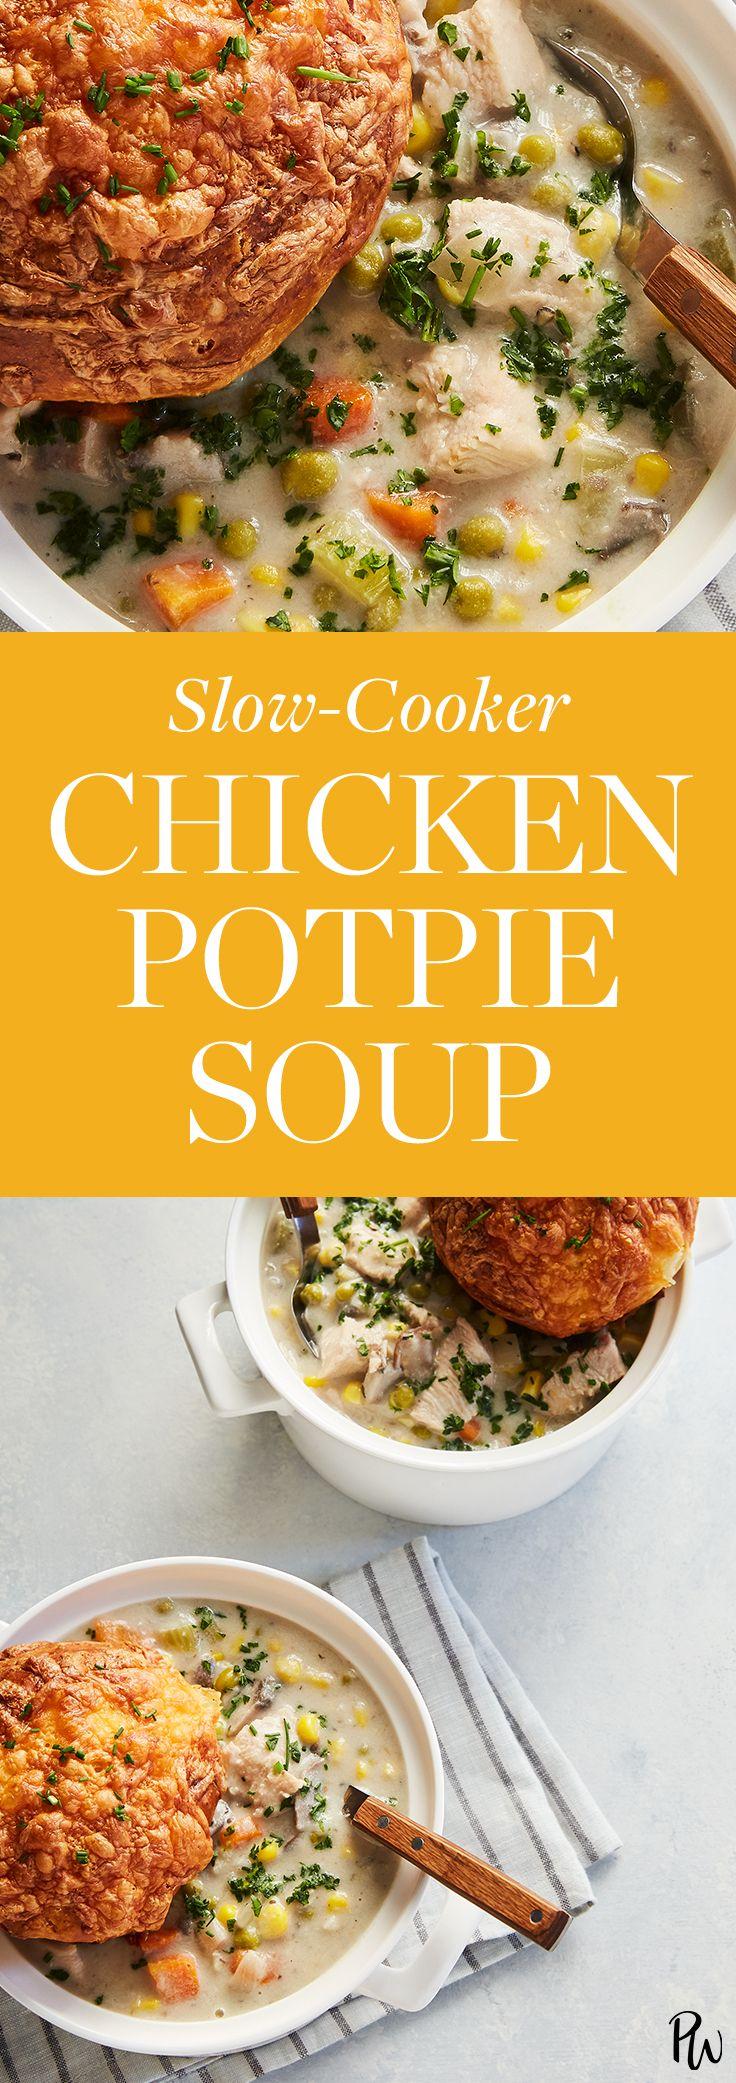 Slow-Cooker Chicken Potpie Soup (PureWow)